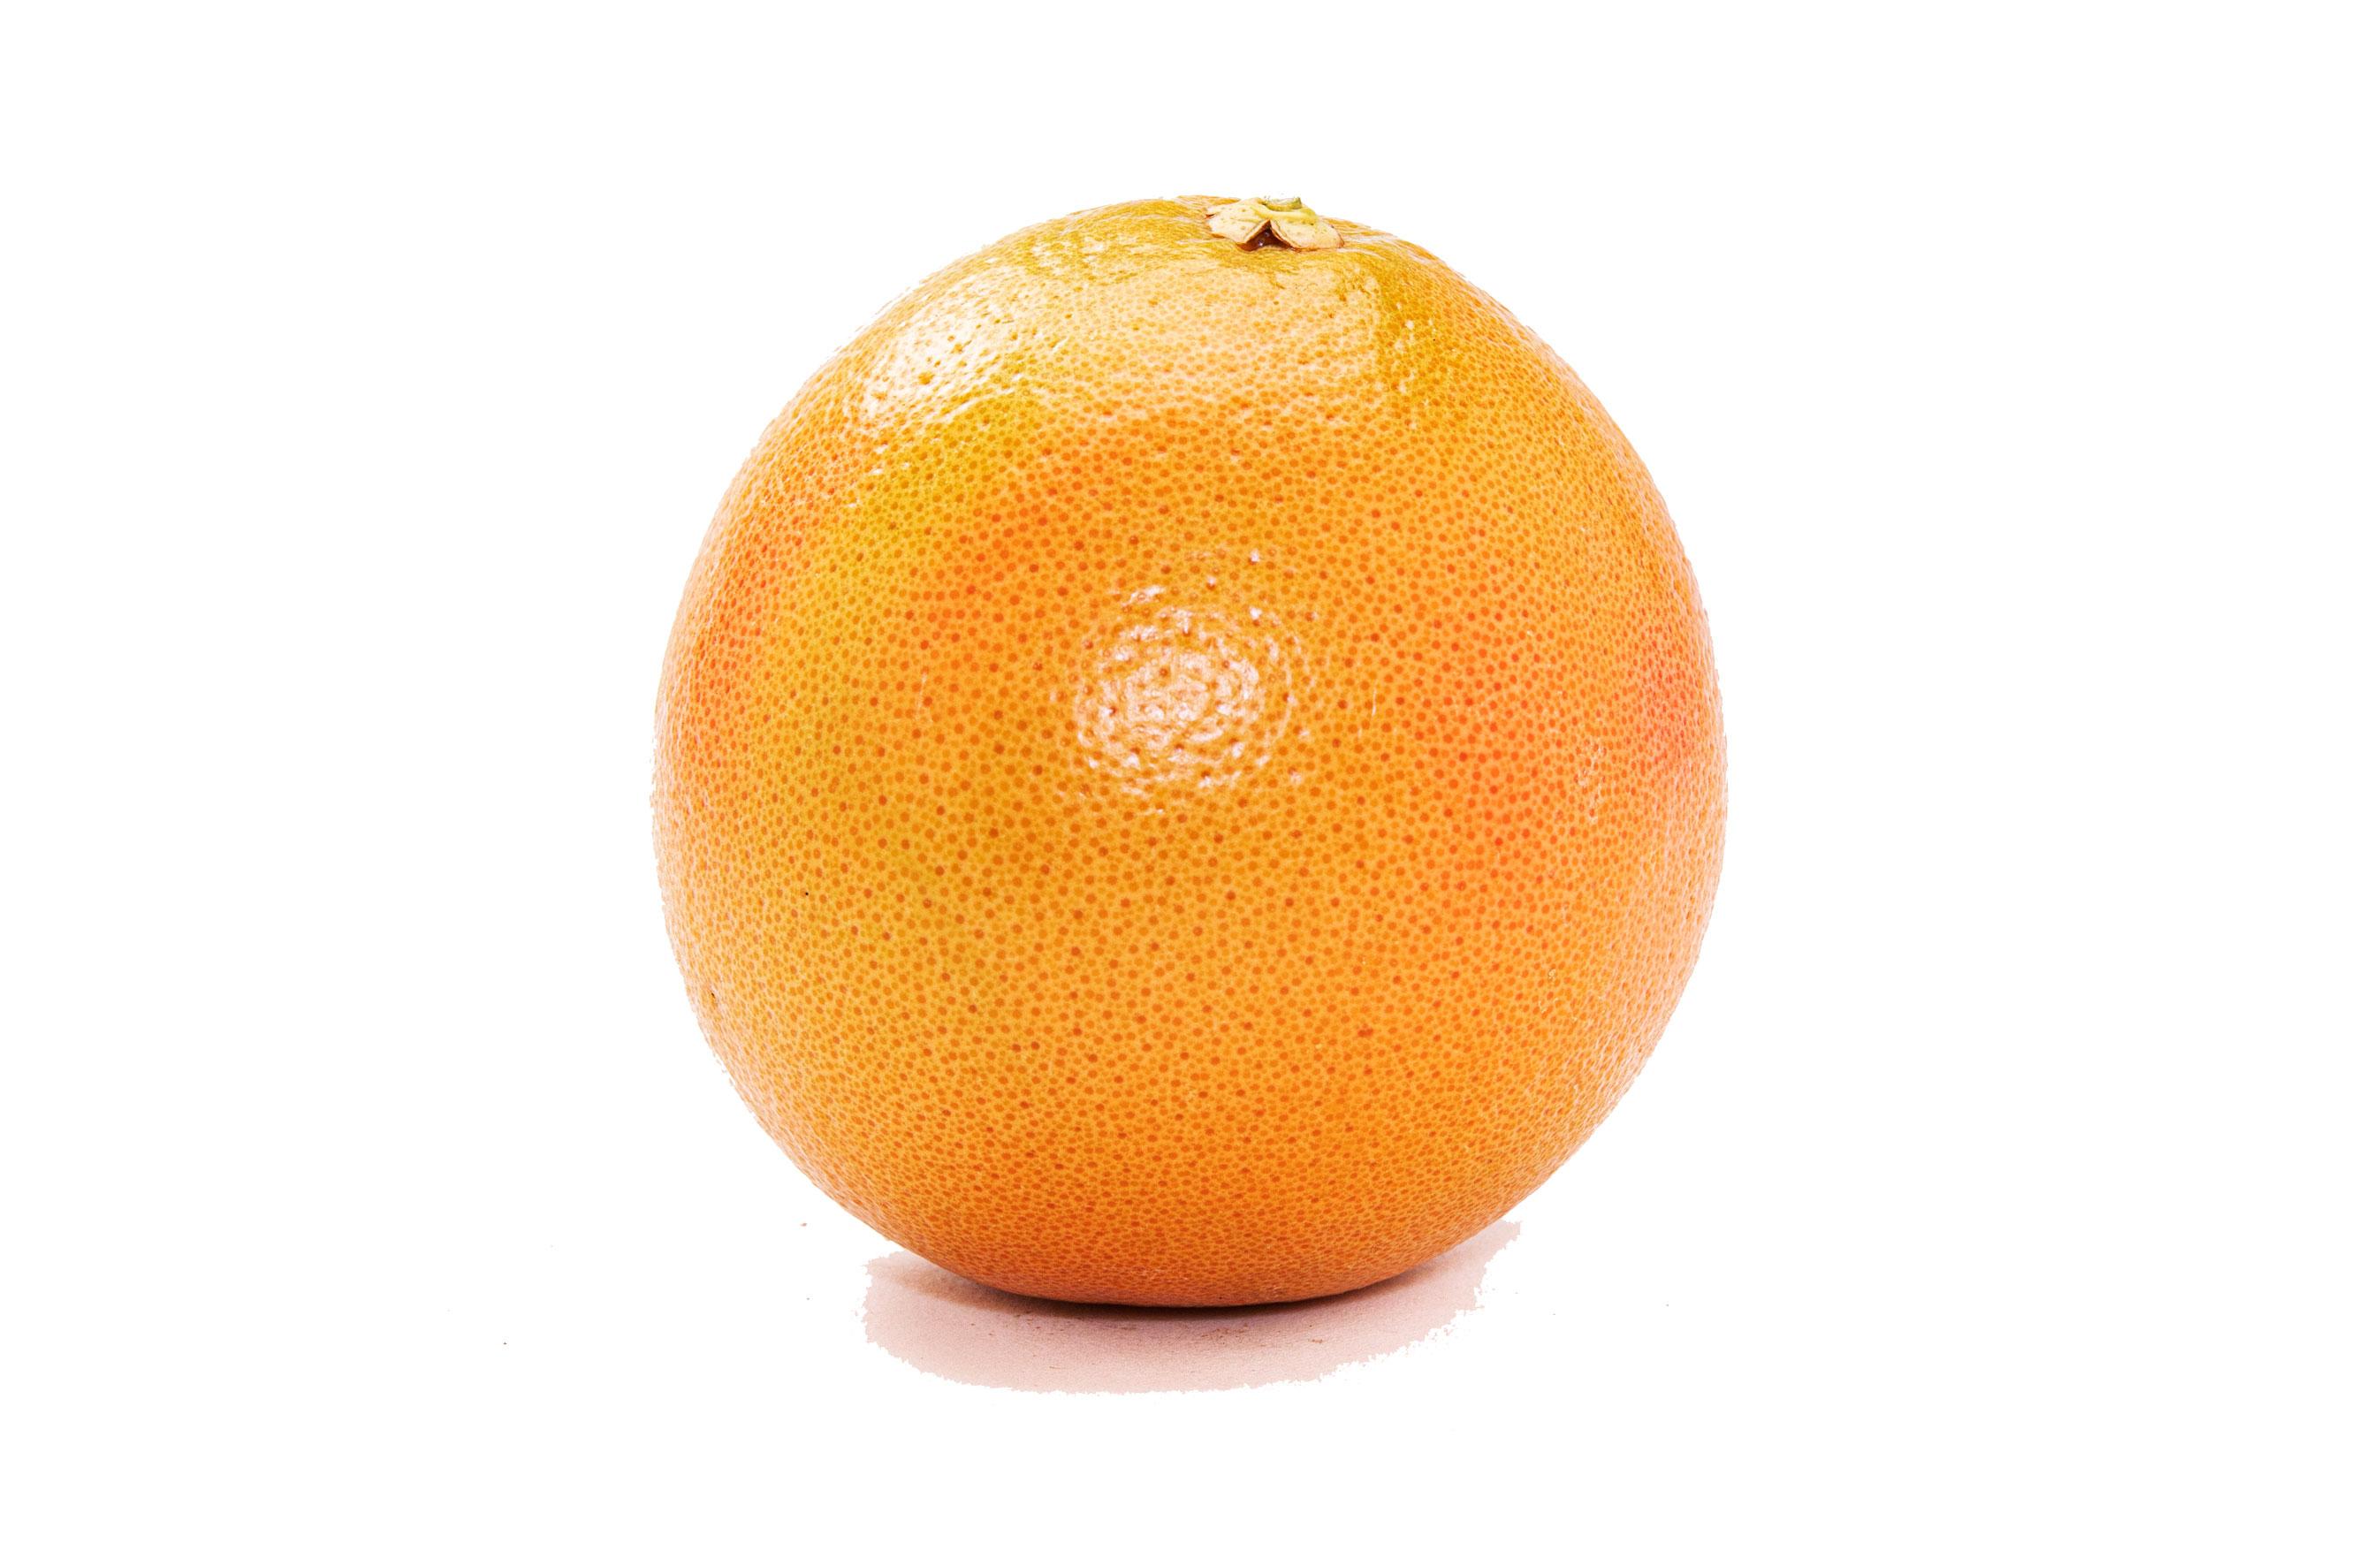 grapefruit-single-yypy